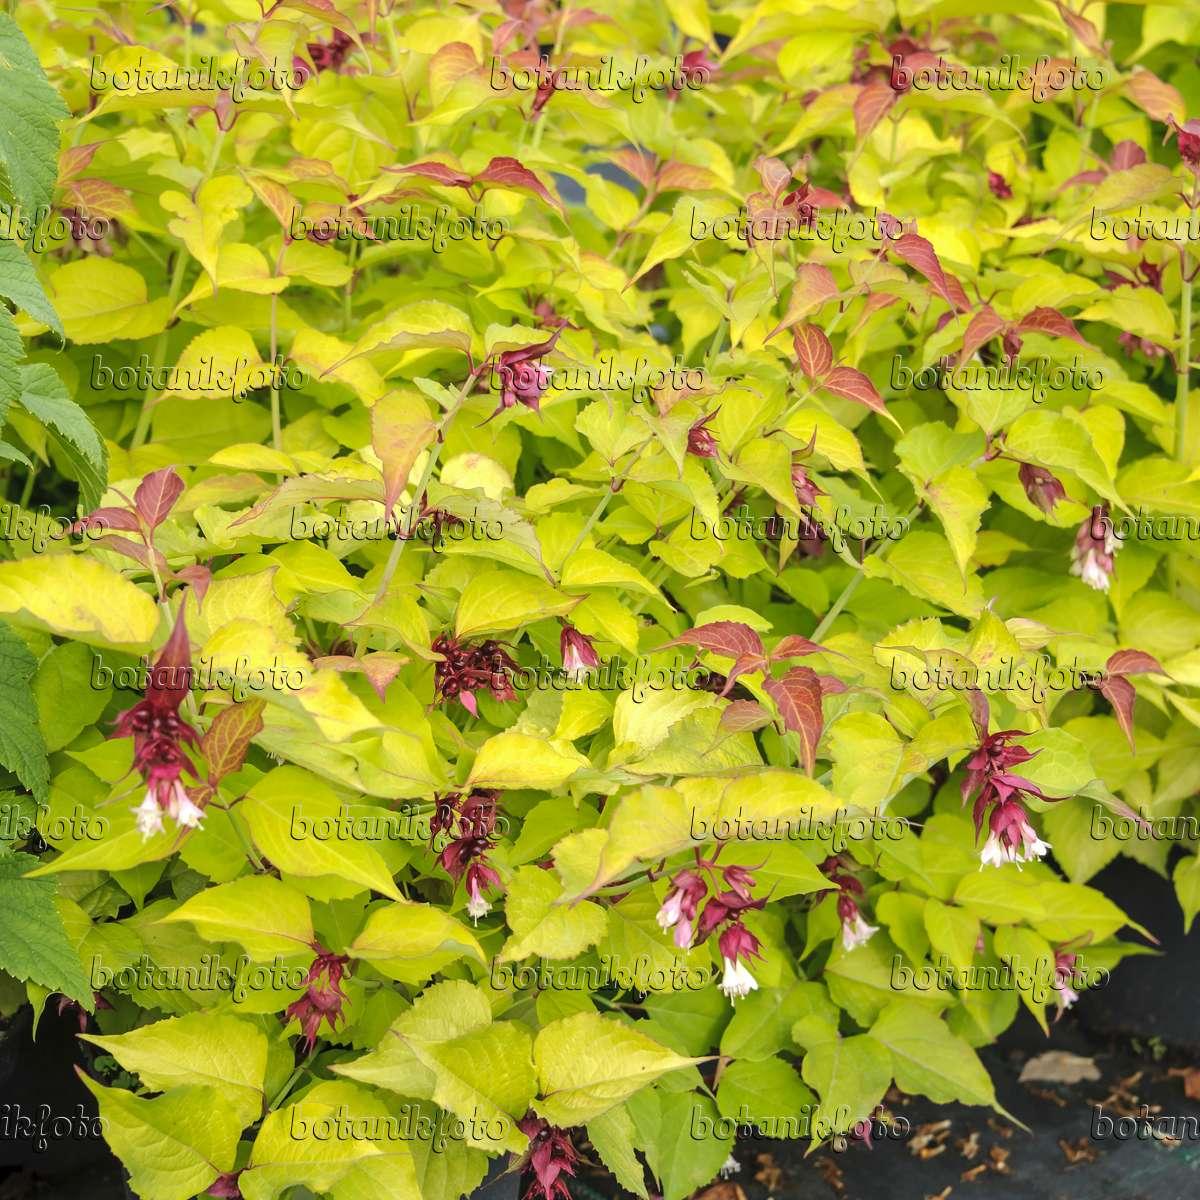 image himalayan honeysuckle leycesteria formosa golden lanterns 535288 images and